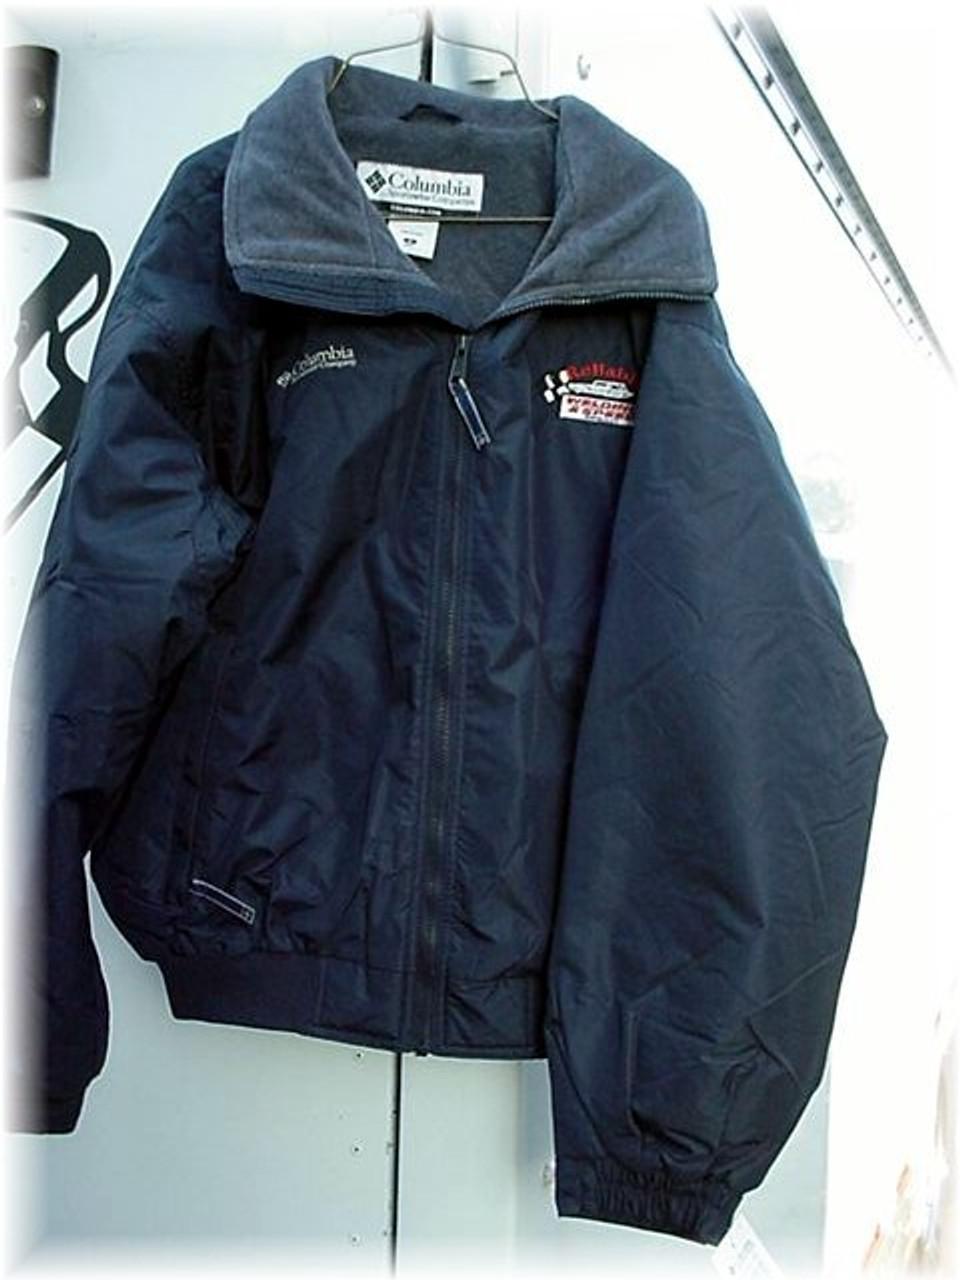 Reliable Welding & Speed Winter Jacket - Columbia - Navy Blue